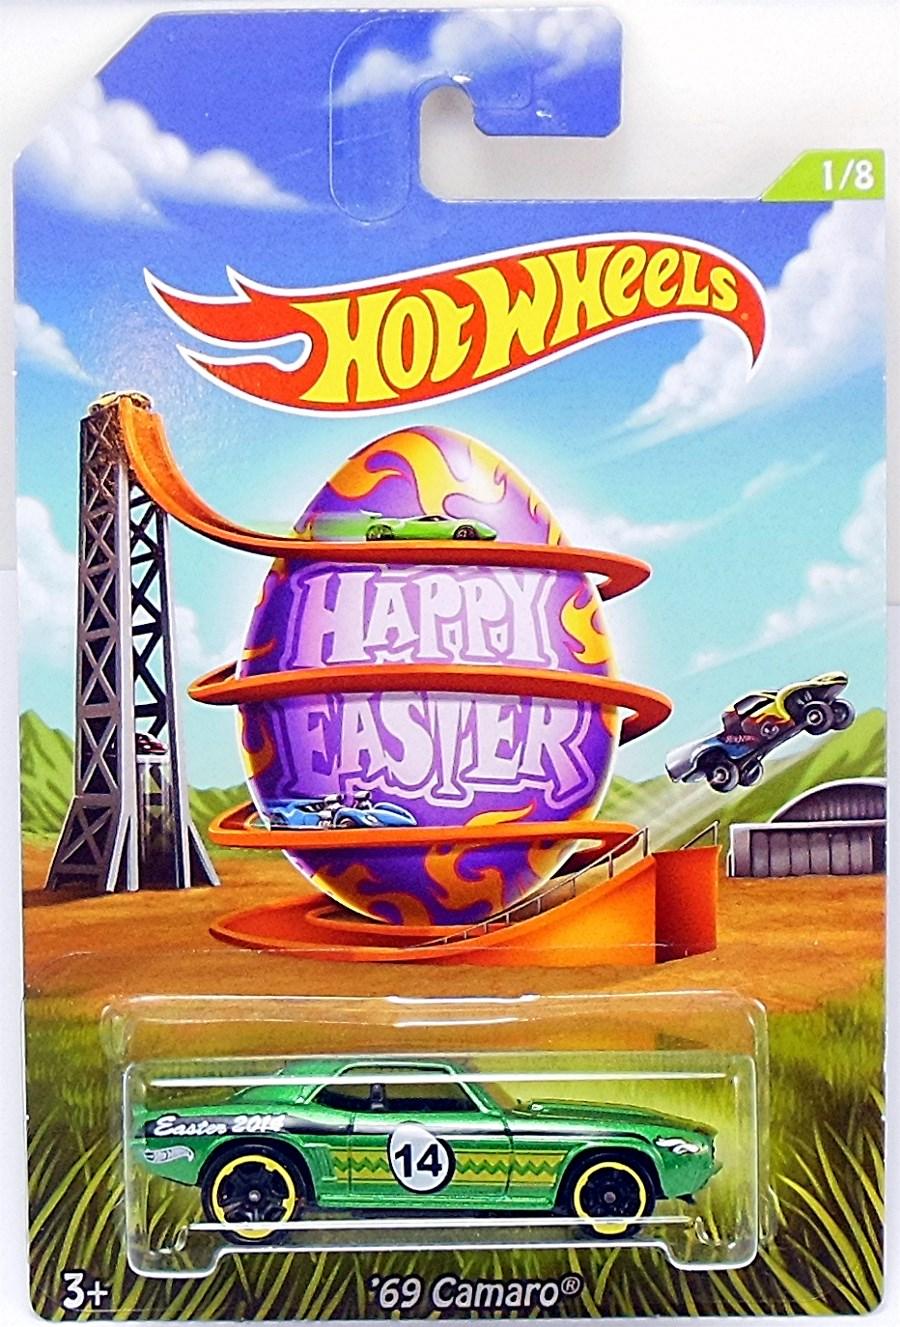 2014 Happy Easter Hot Wheels Newsletter